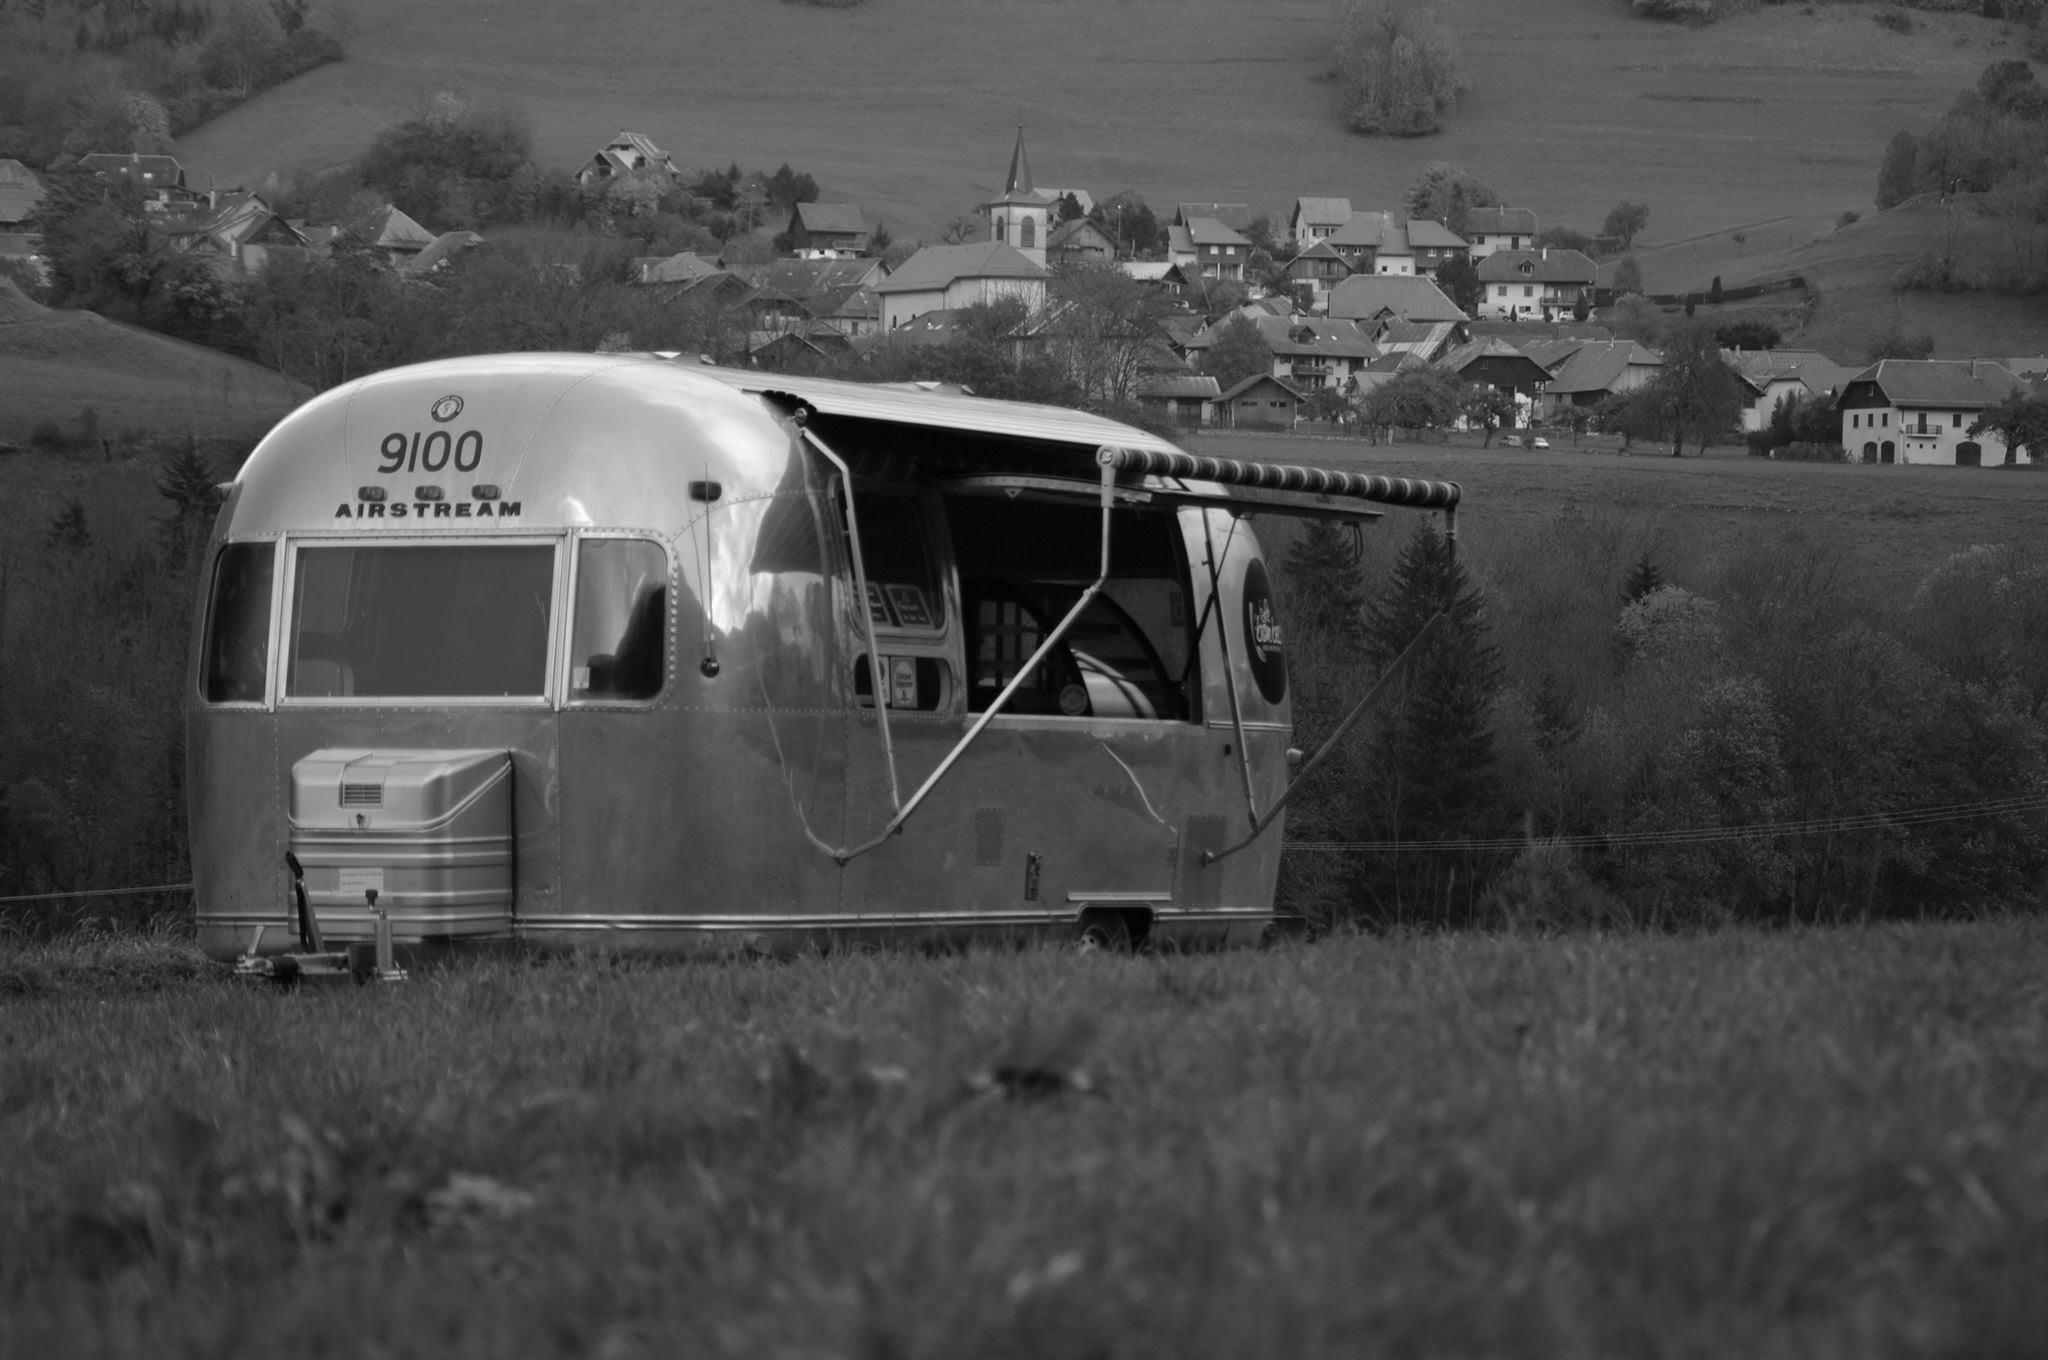 Une Belle Caravane Airstream en Black & White